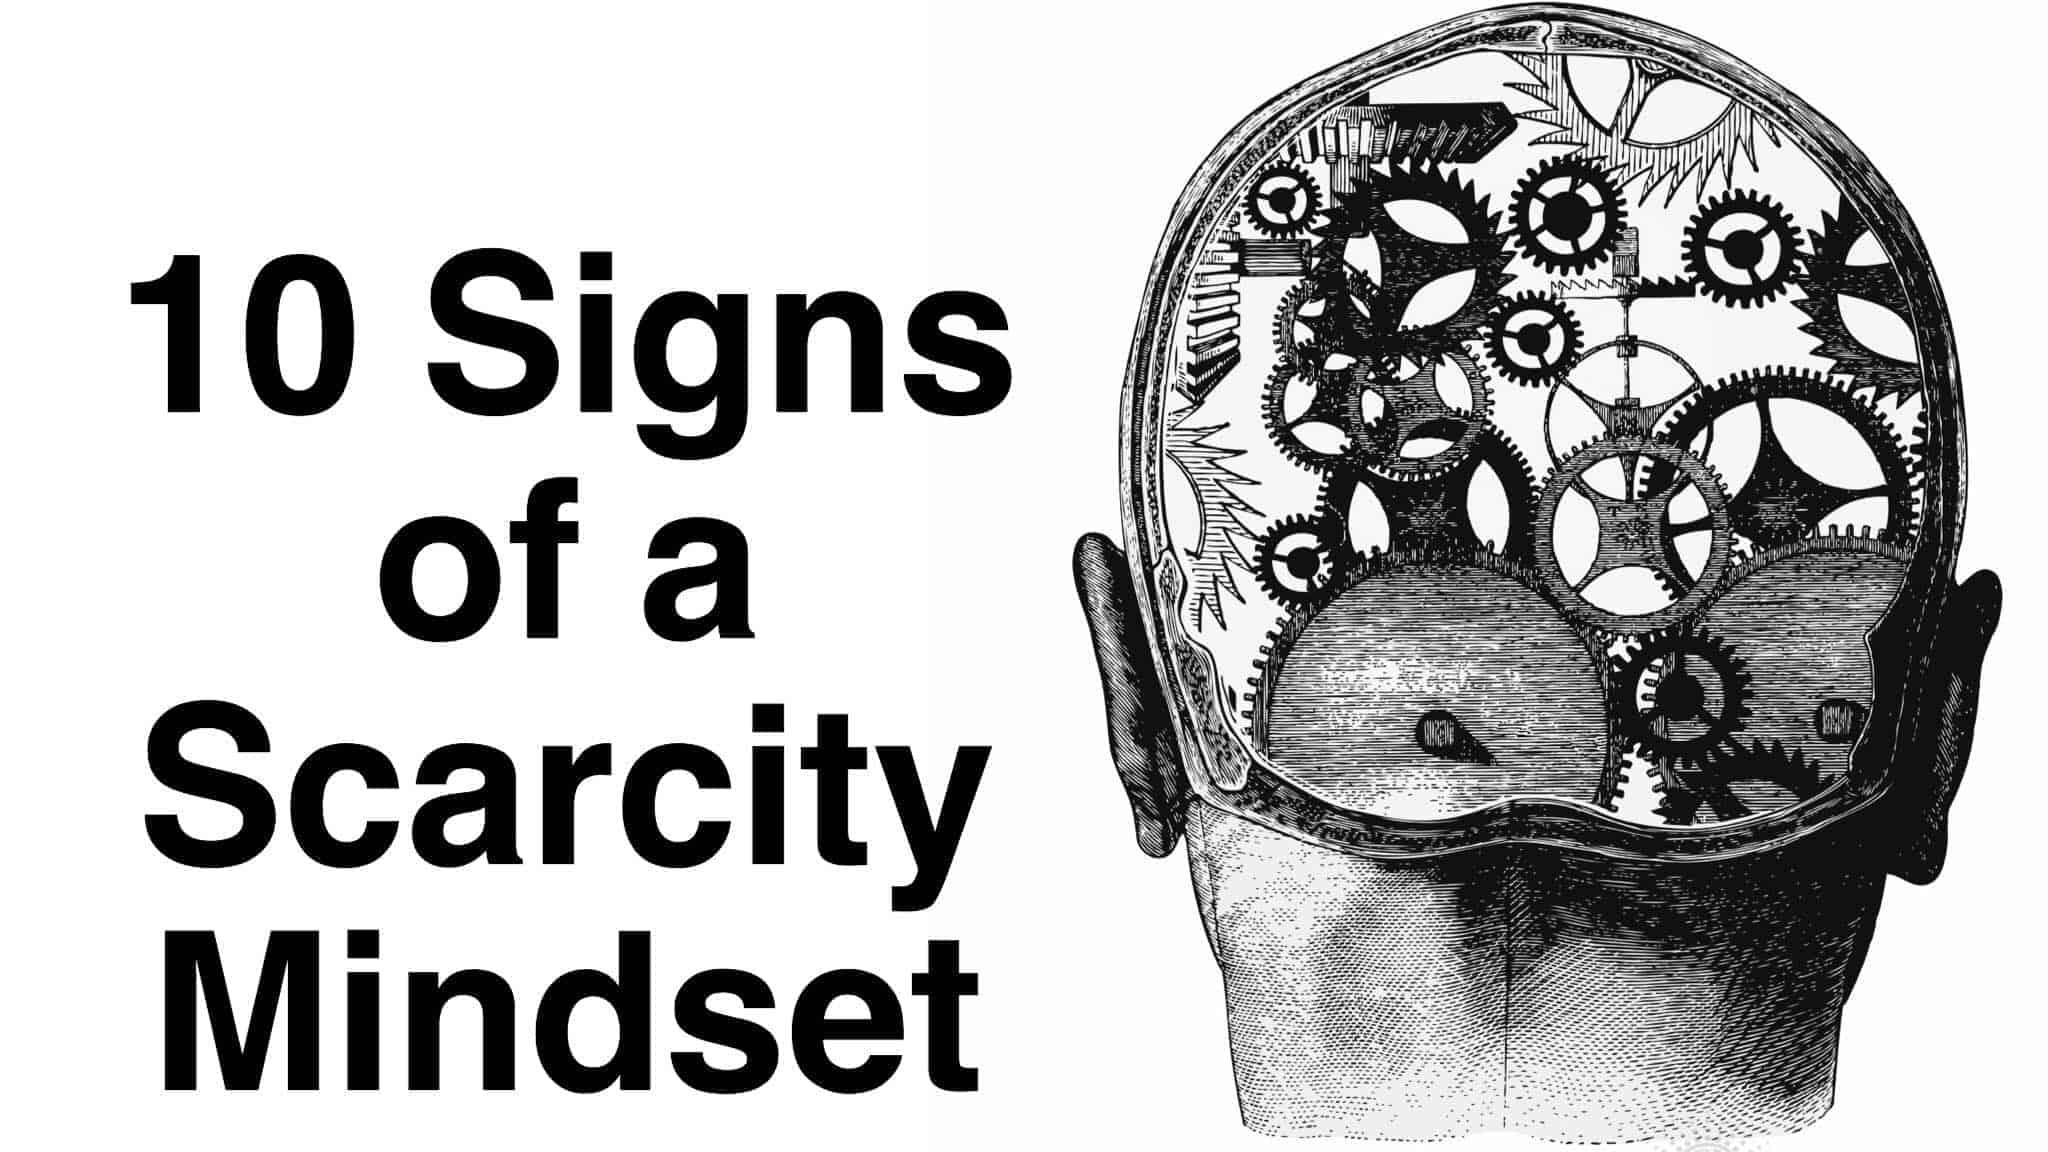 10 Signs Of A Scarcity Mindset